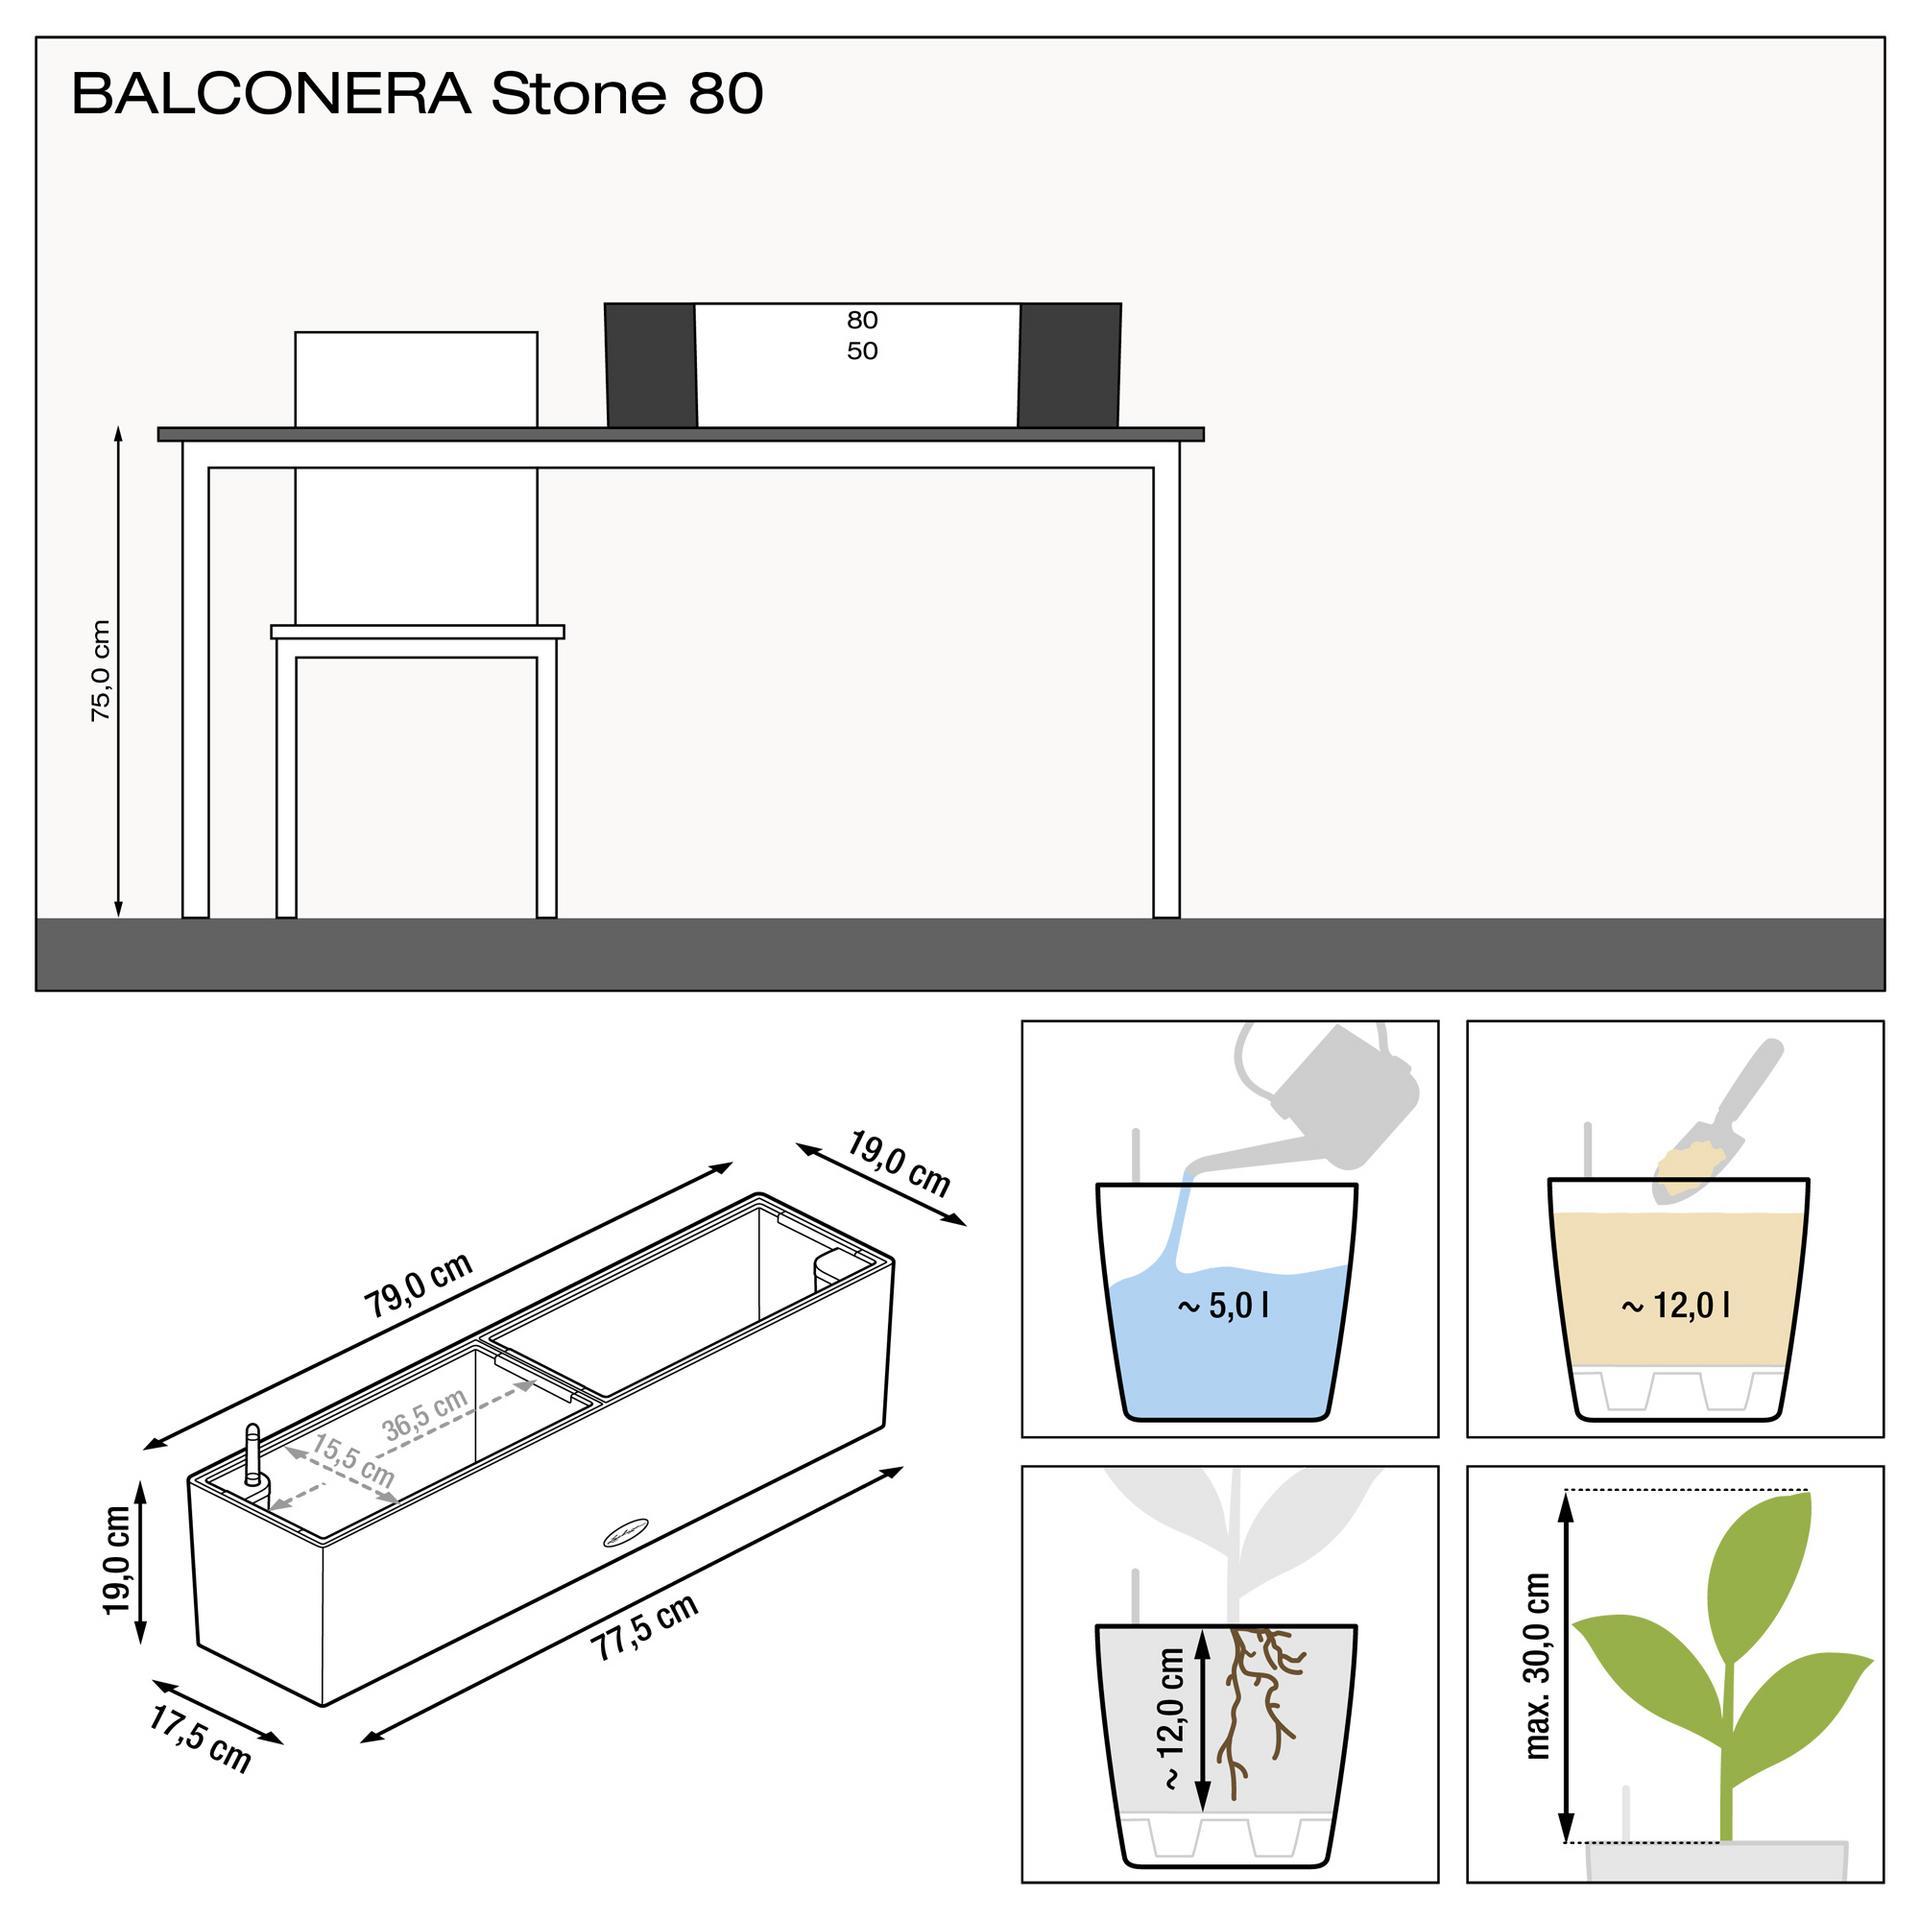 le_balconera-stone80_product_addi_nz